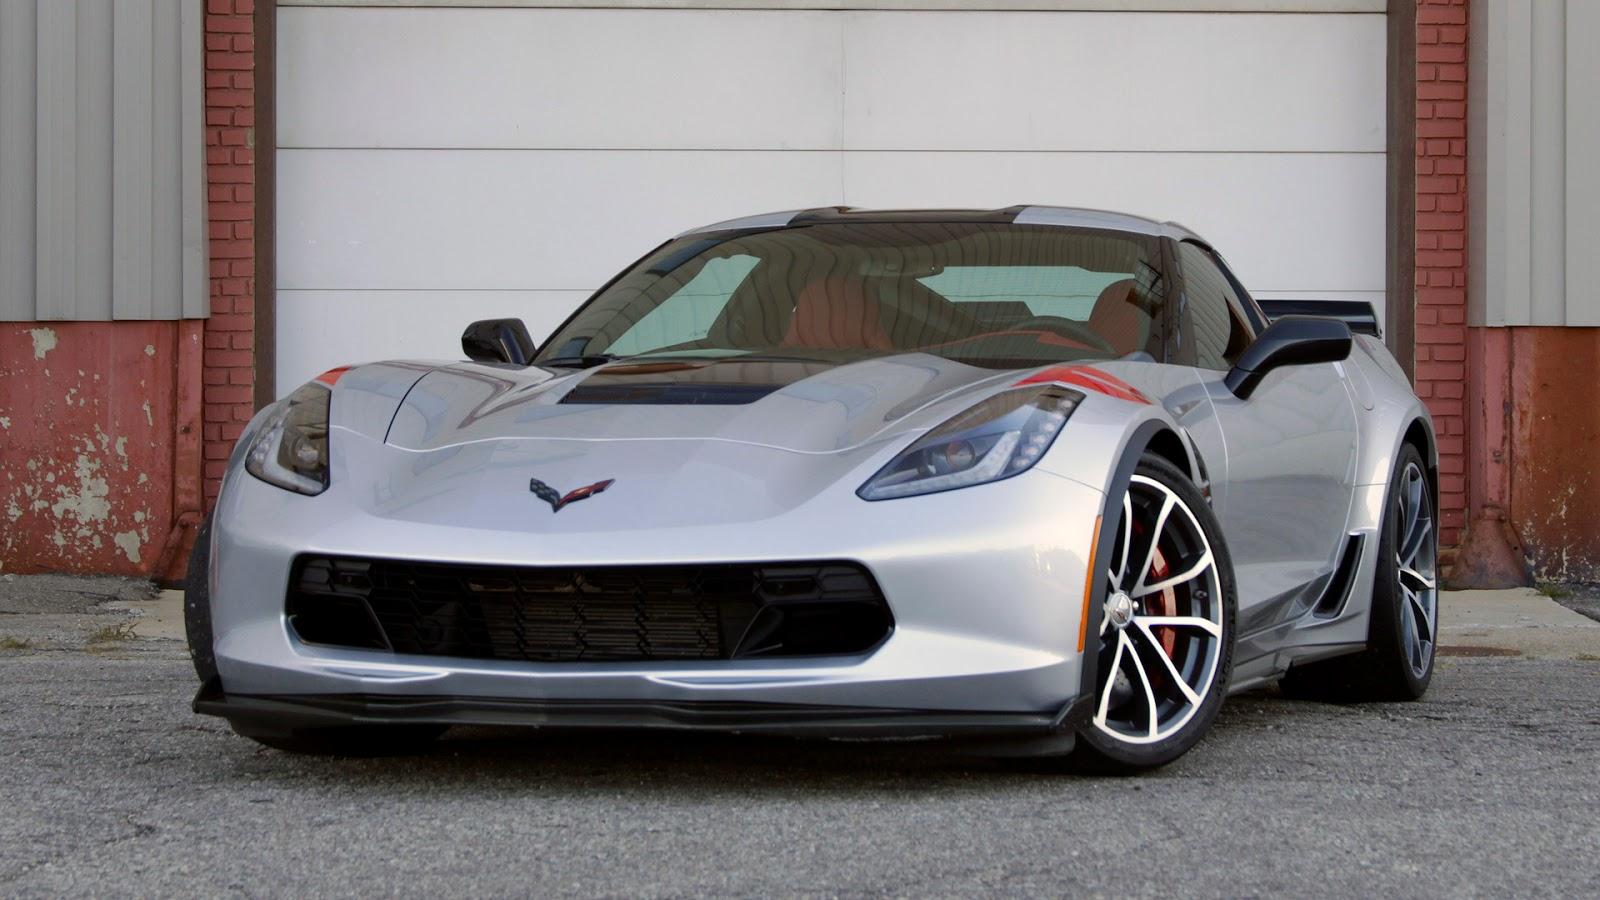 2017 chevrolet corvette grand sport review Ιδιοκτήτες Corvette πάνε τη GM στα δικαστήρια για ελαττωματικές ζάντες Chevrolet, Chevrolet Corvette